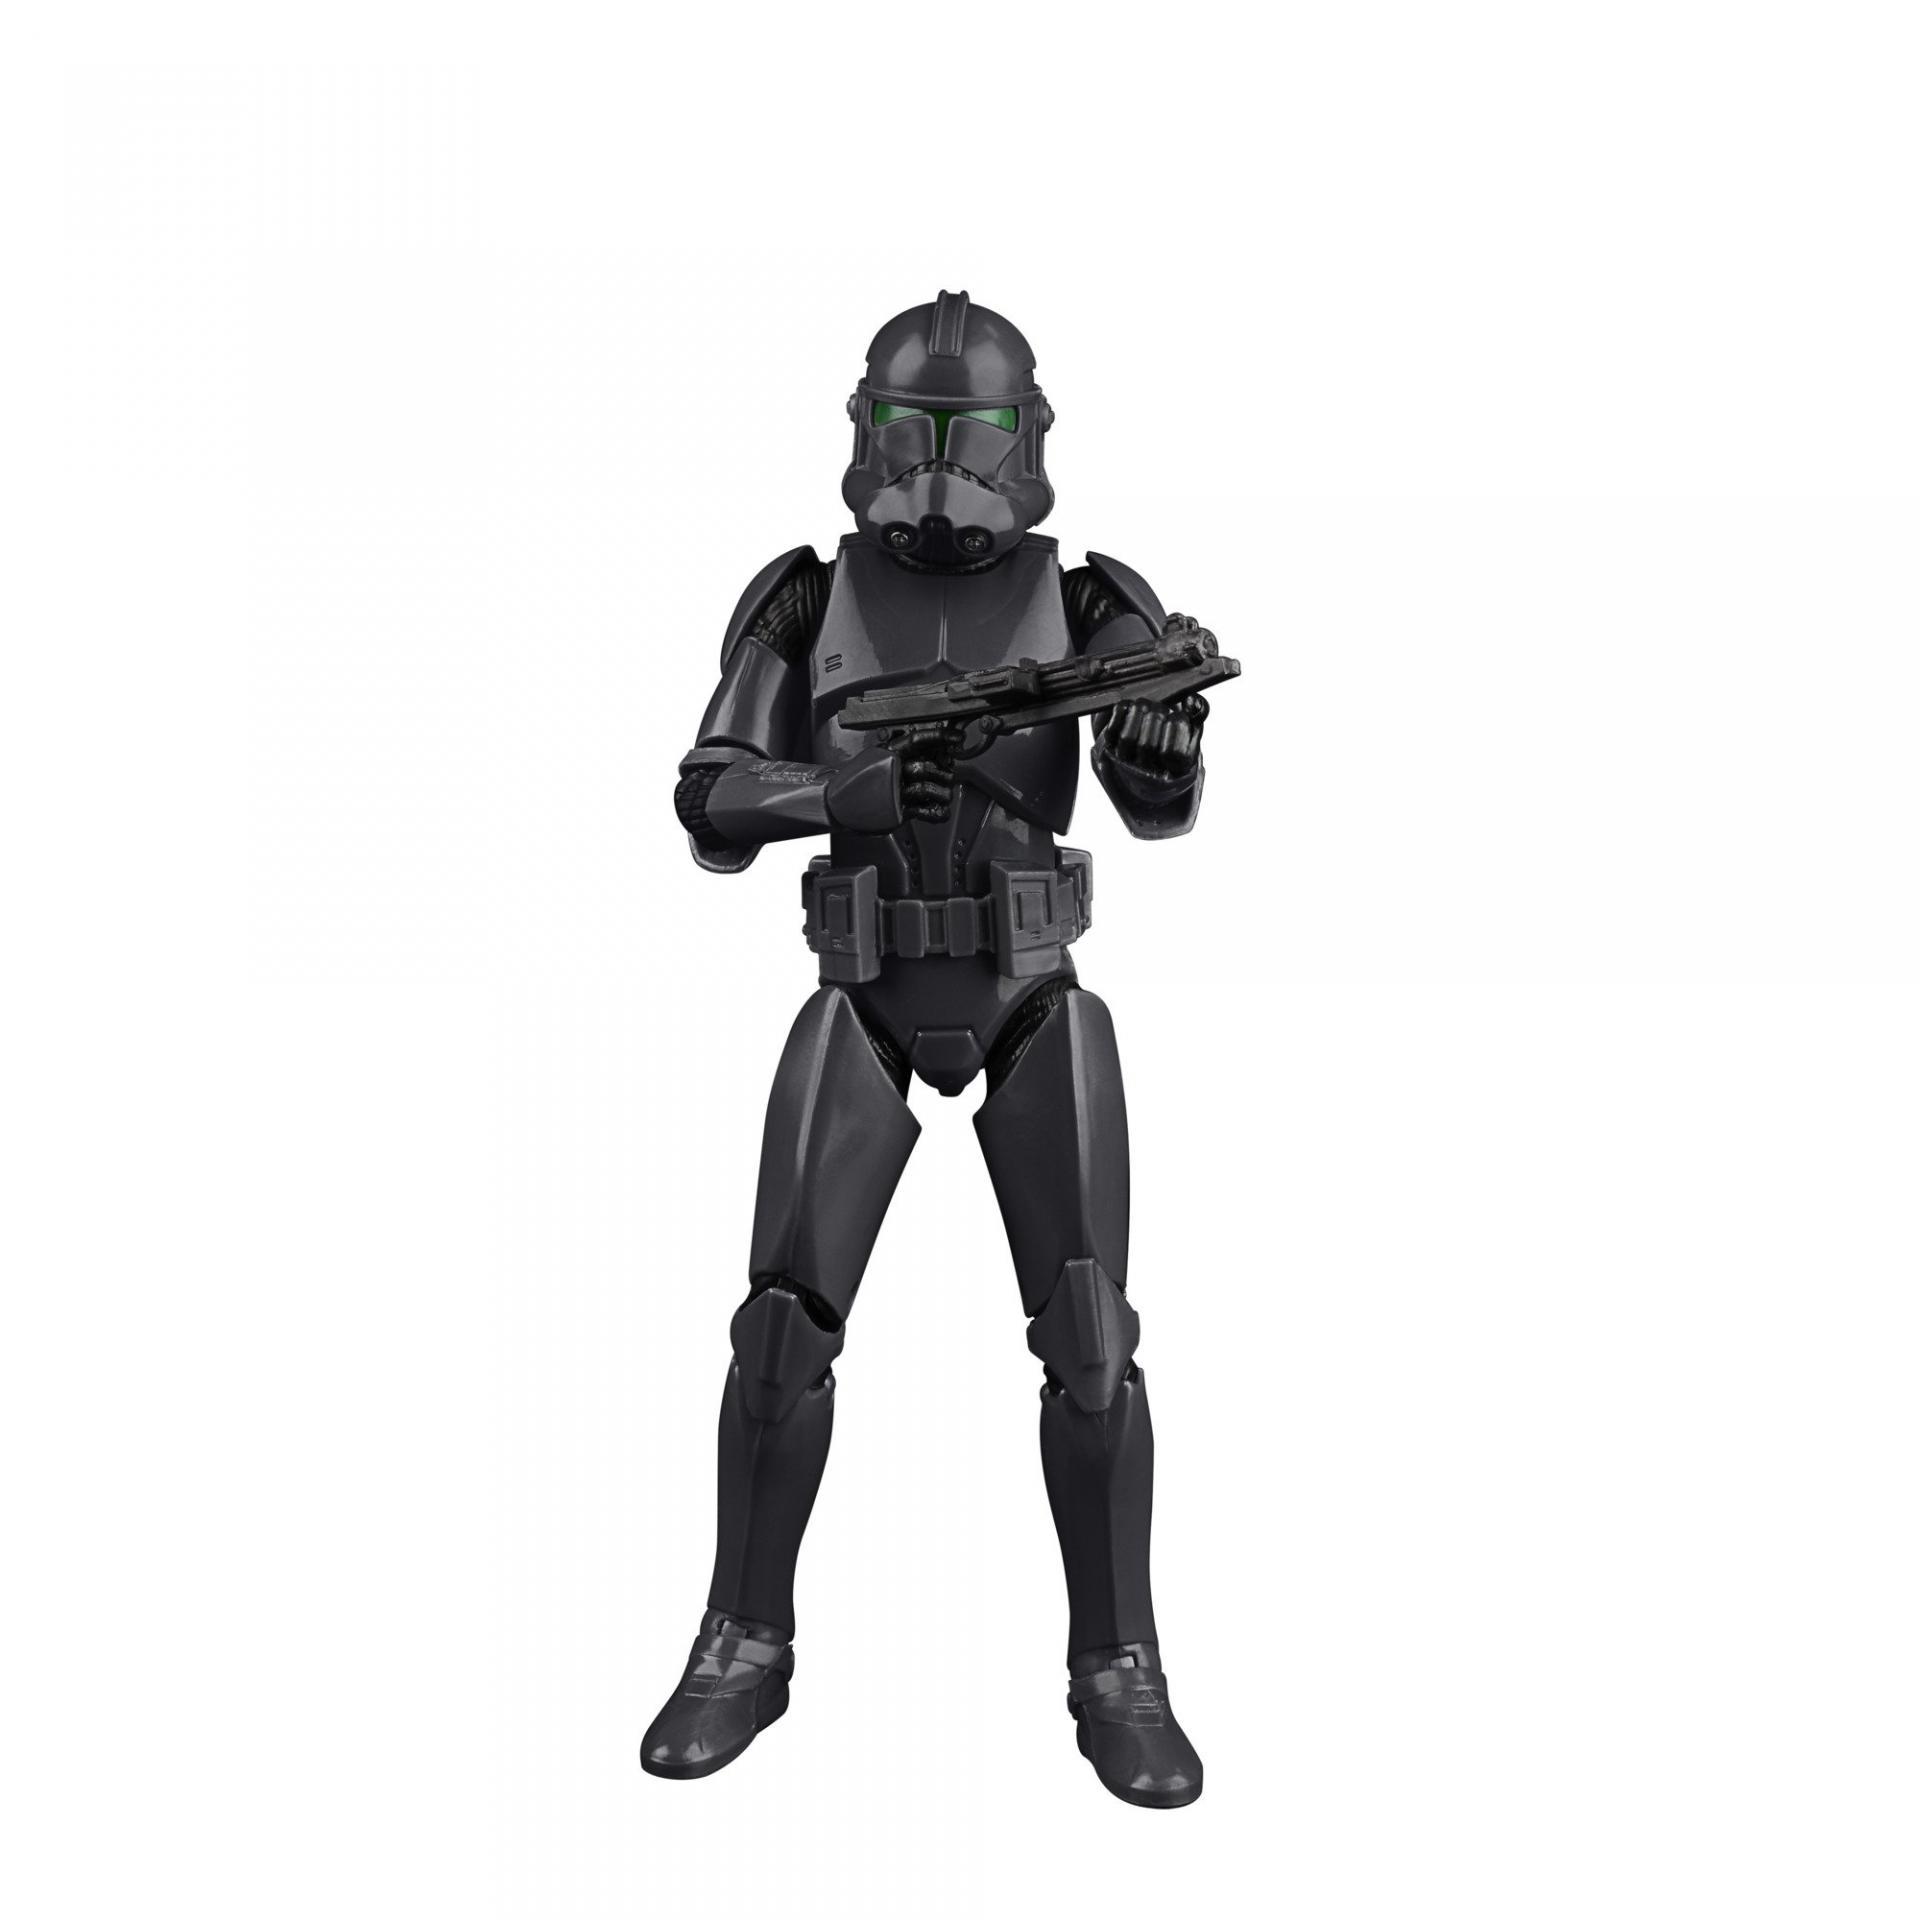 Star wars the black series elite squad trooper 15cm6